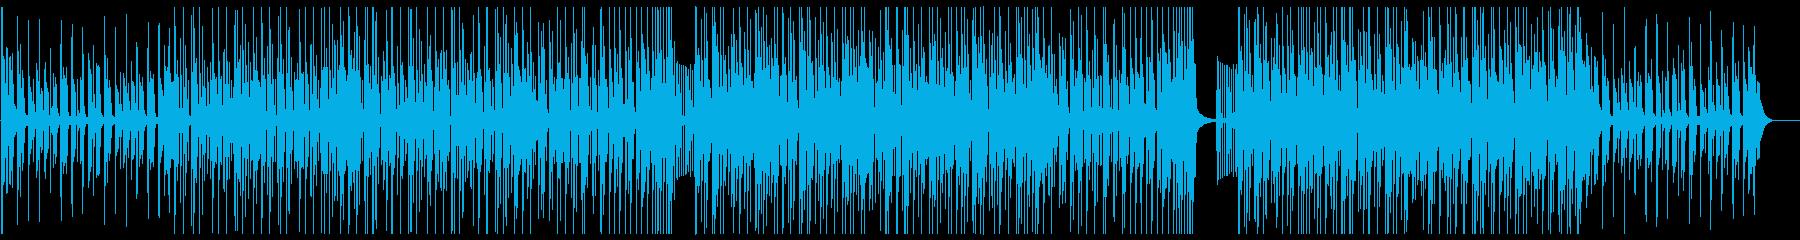 K-POP、洋楽、ヒップホップ bの再生済みの波形